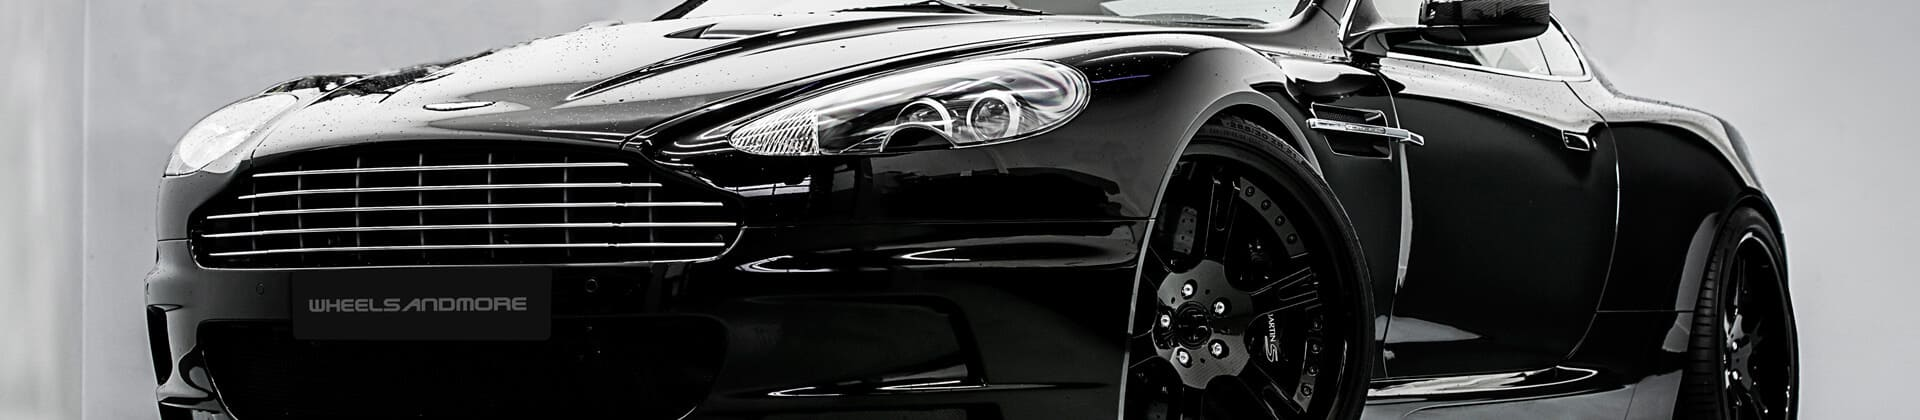 DBS Aston leistungssteigerung